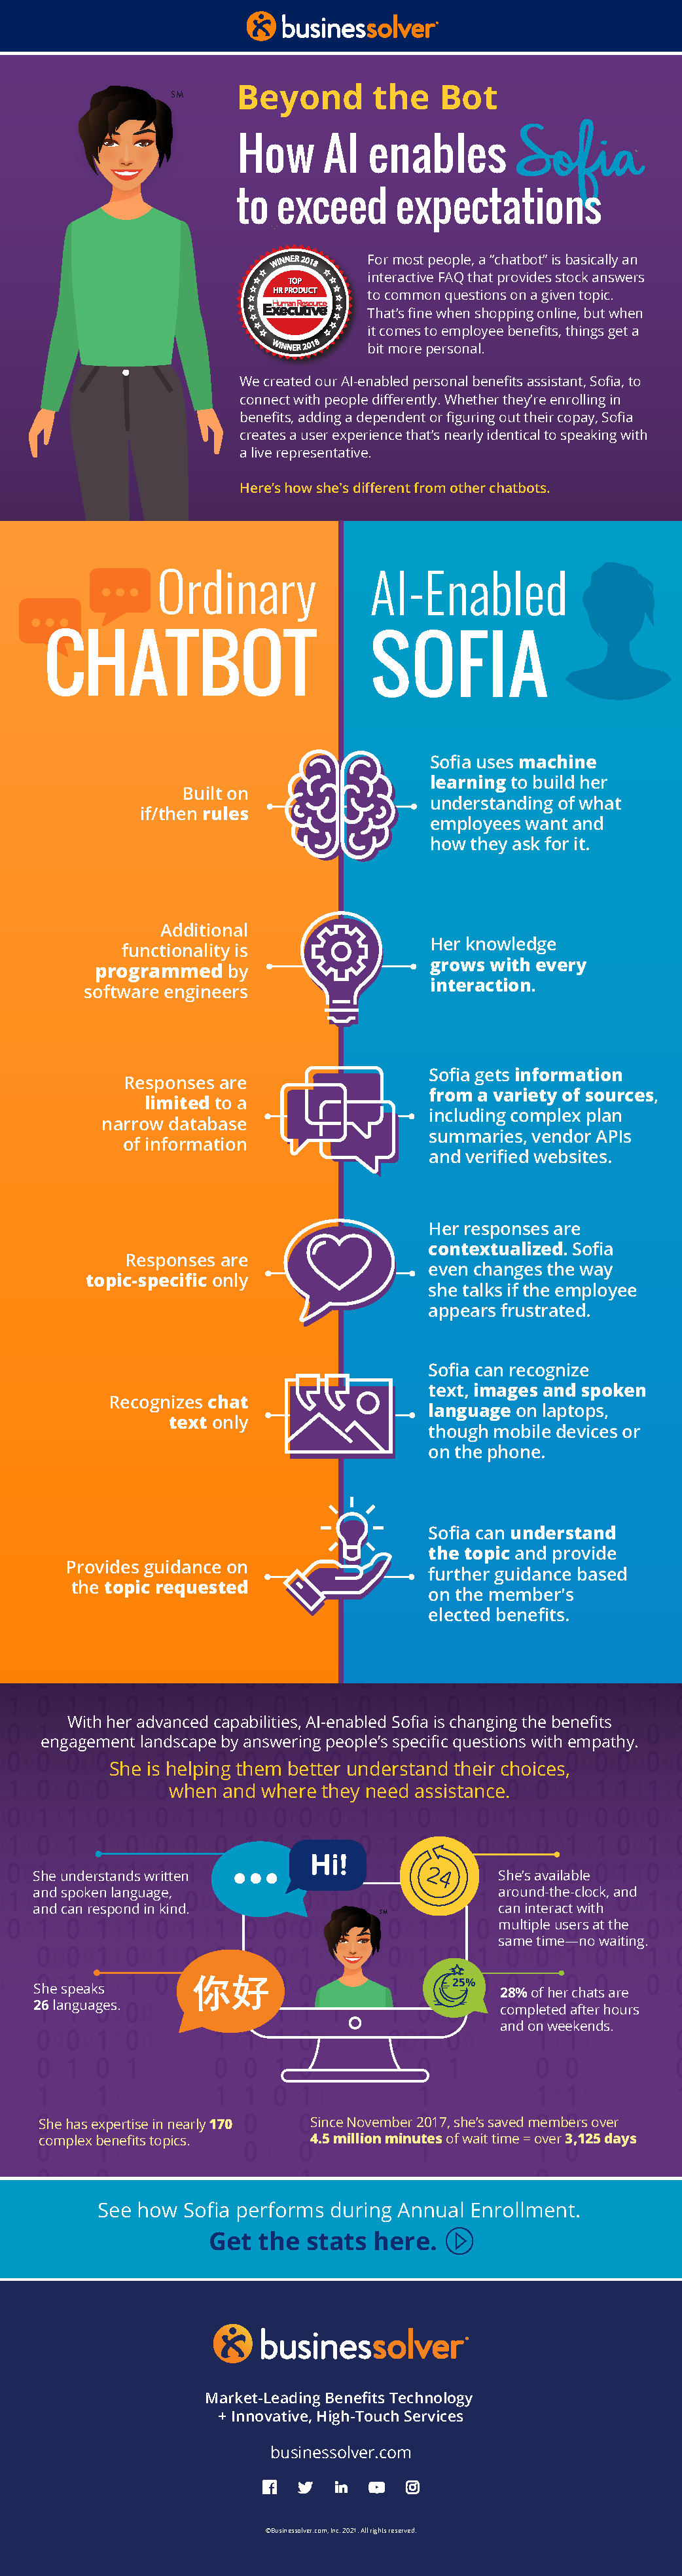 lp-image-beyond-the-bot-sofia-infographic